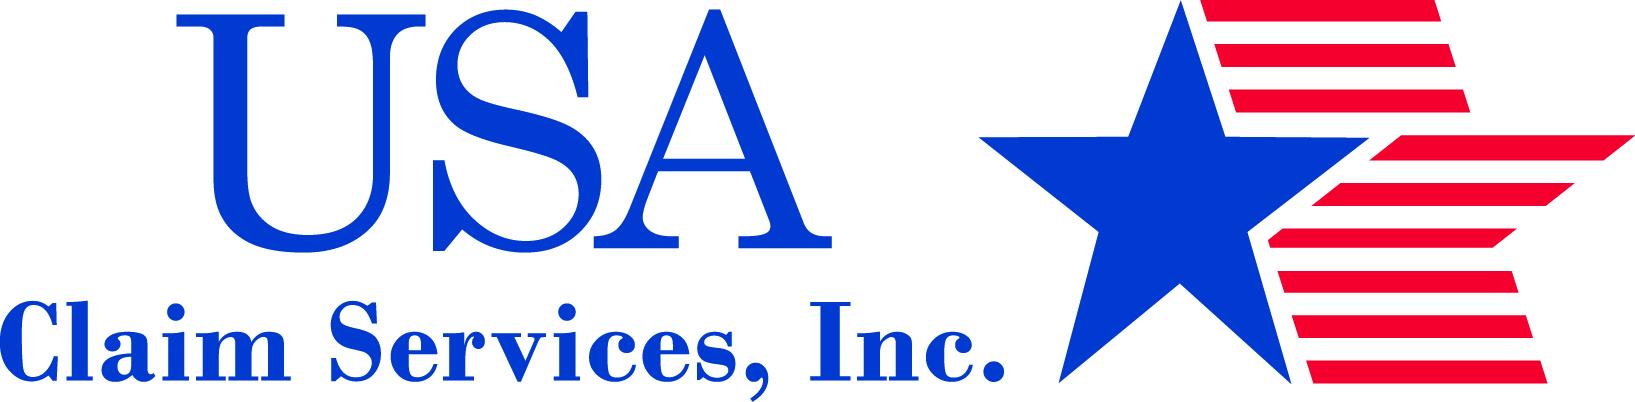 USA Claim Services, Inc.